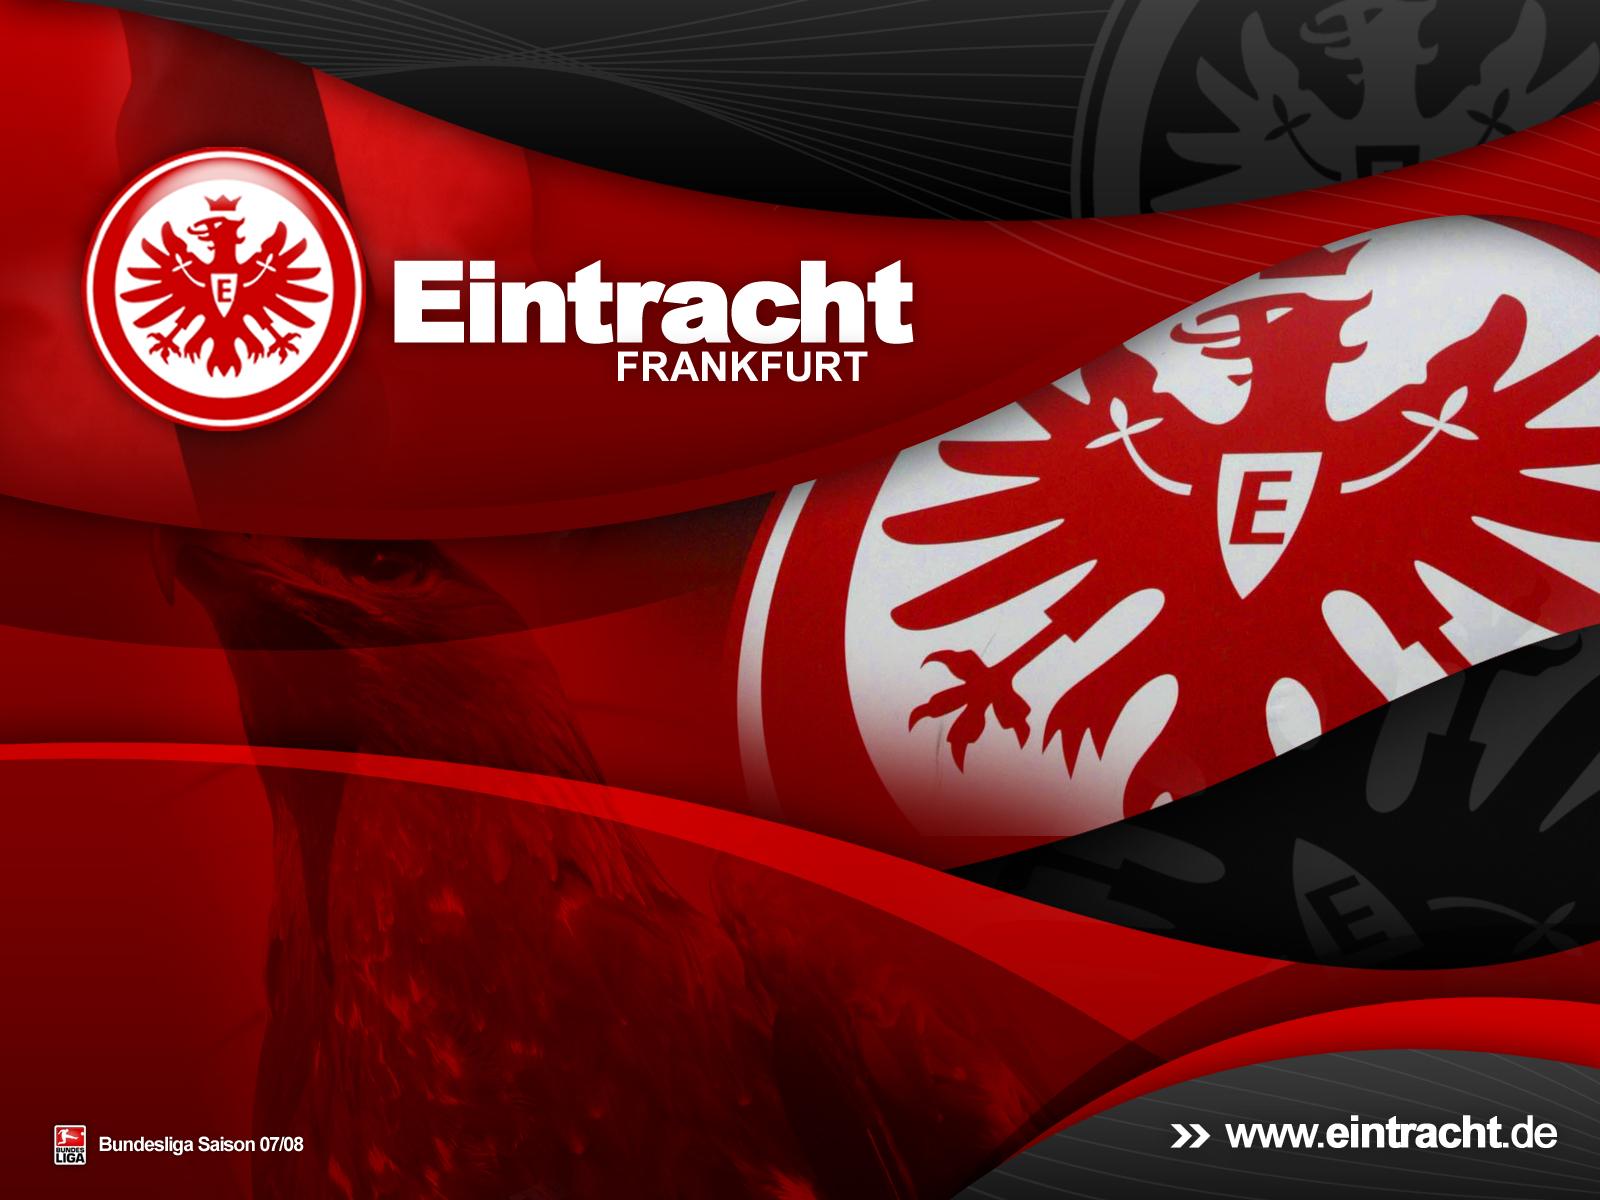 eintracht_frankfurt_3d_logo